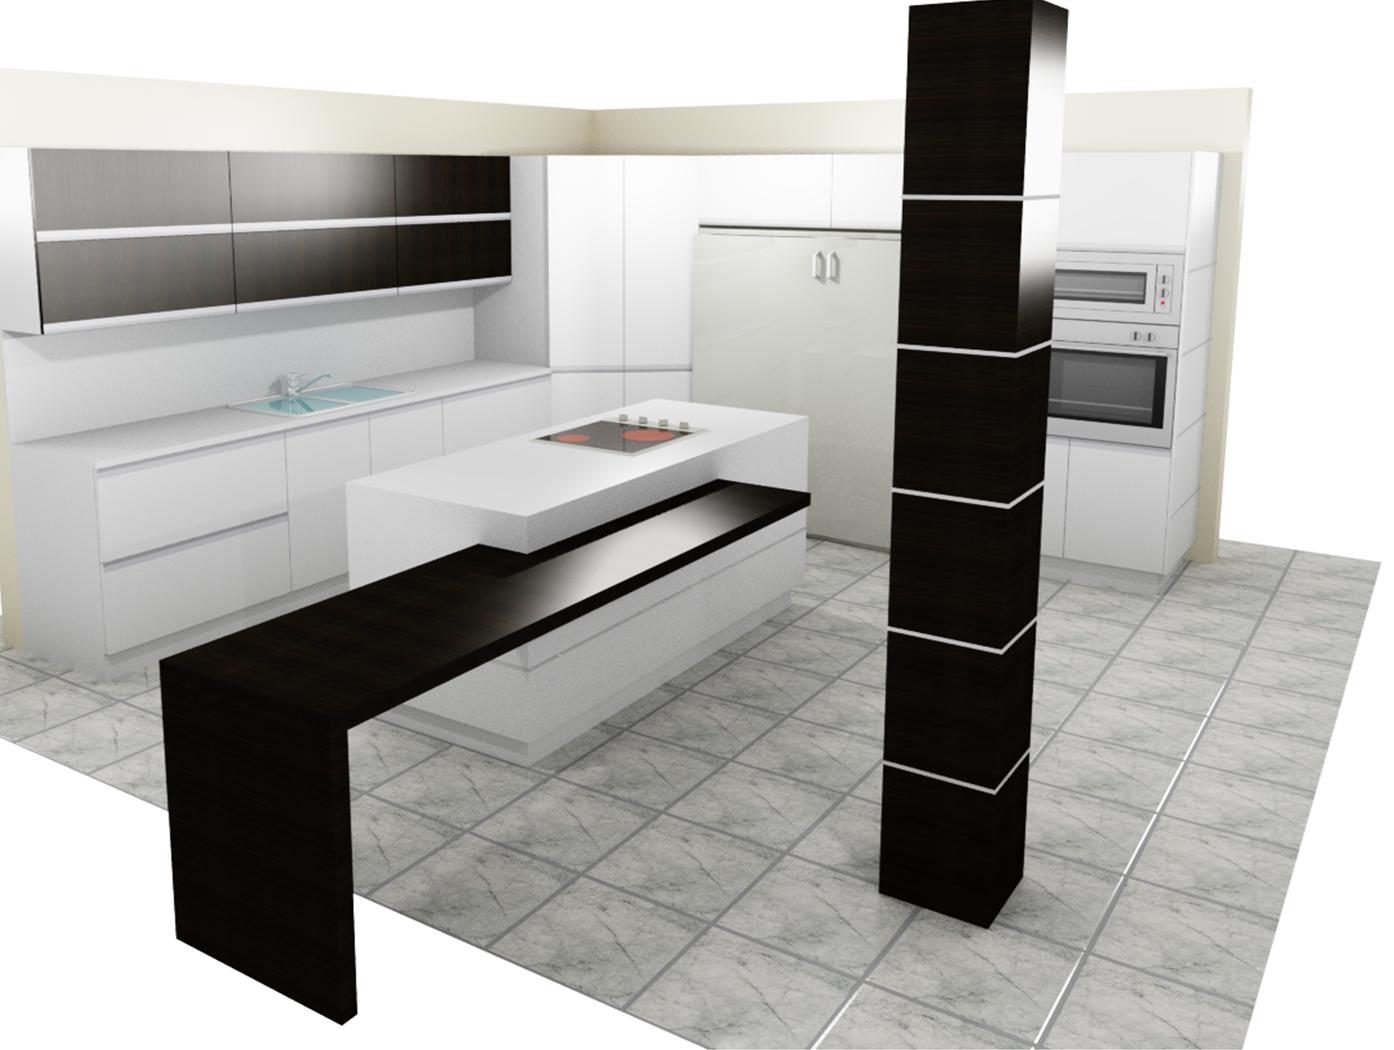 Muebles modulares de cocina muebles modulares cocina - Muebles de cocina modulares ...